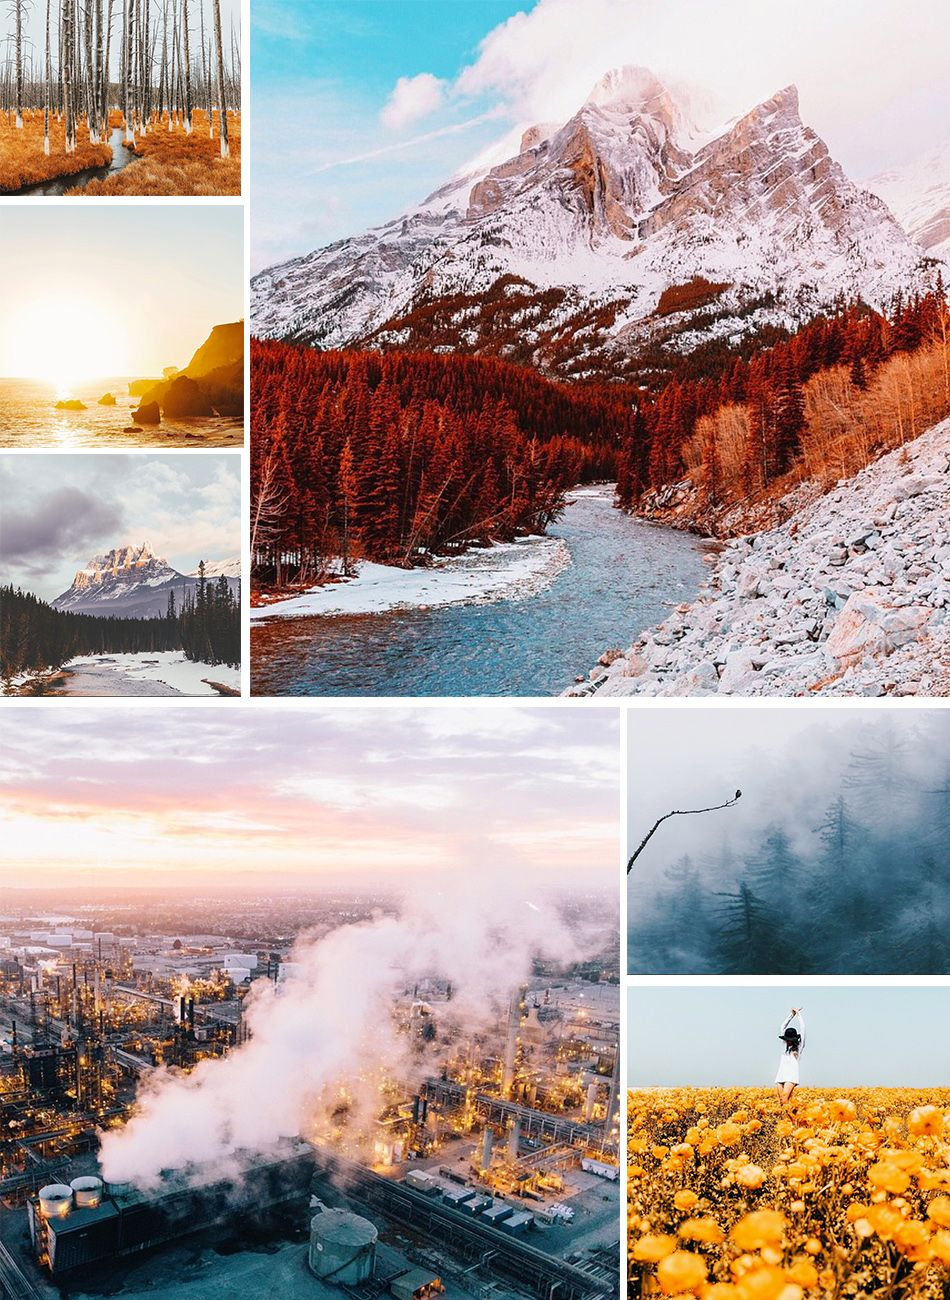 Insta Wanderlust Vol. V | Four Travel Instagram Accounts To Follow